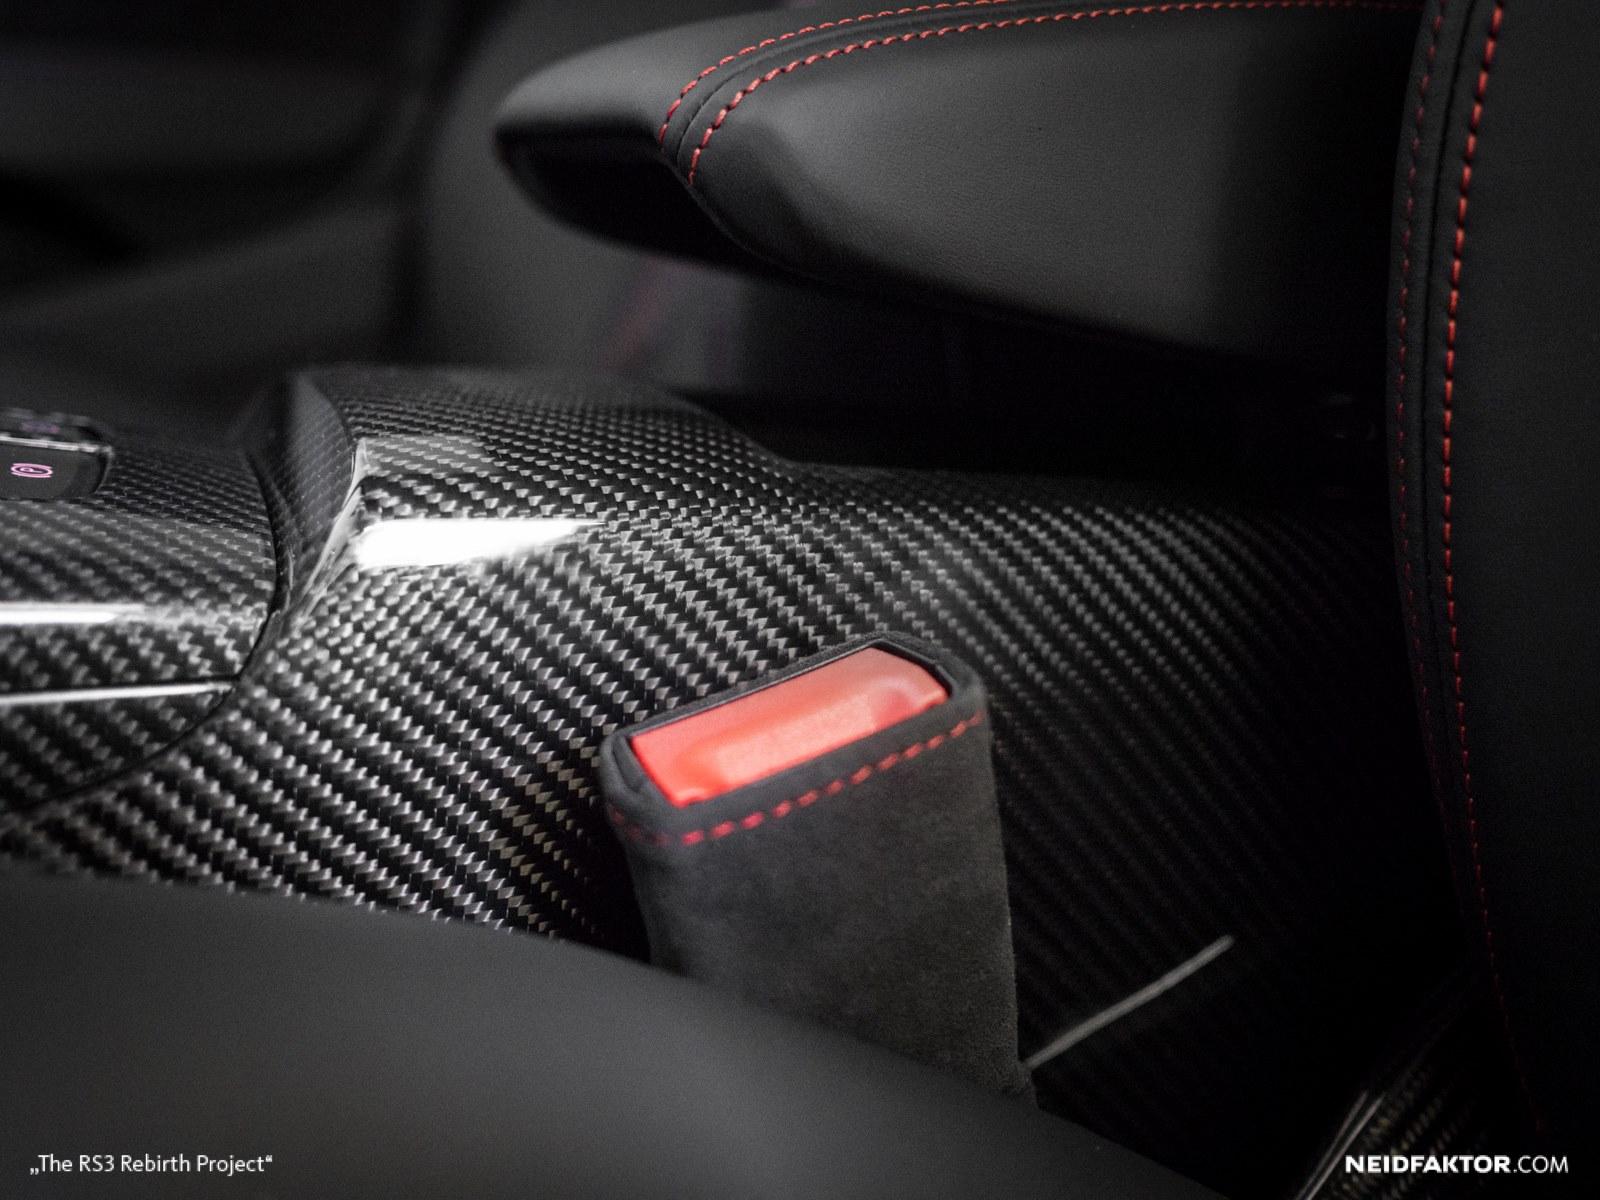 Carbon Wallpaper Iphone X New Audi Rs3 Gets Carbon Fiber And Alcantara Interior From